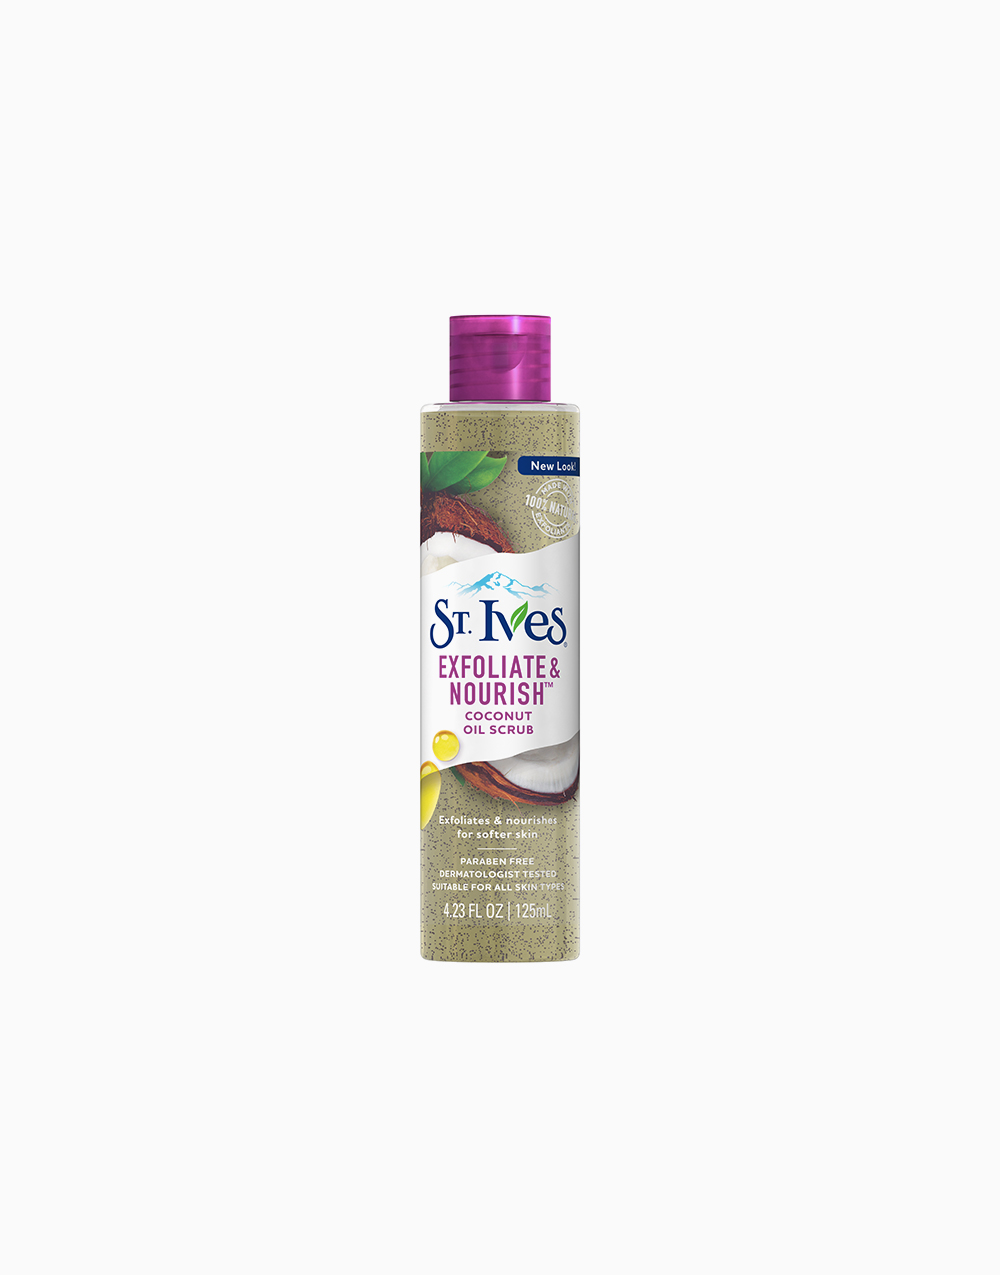 Exfoliate & Nourish Coconut Oil Scrub by St. Ives